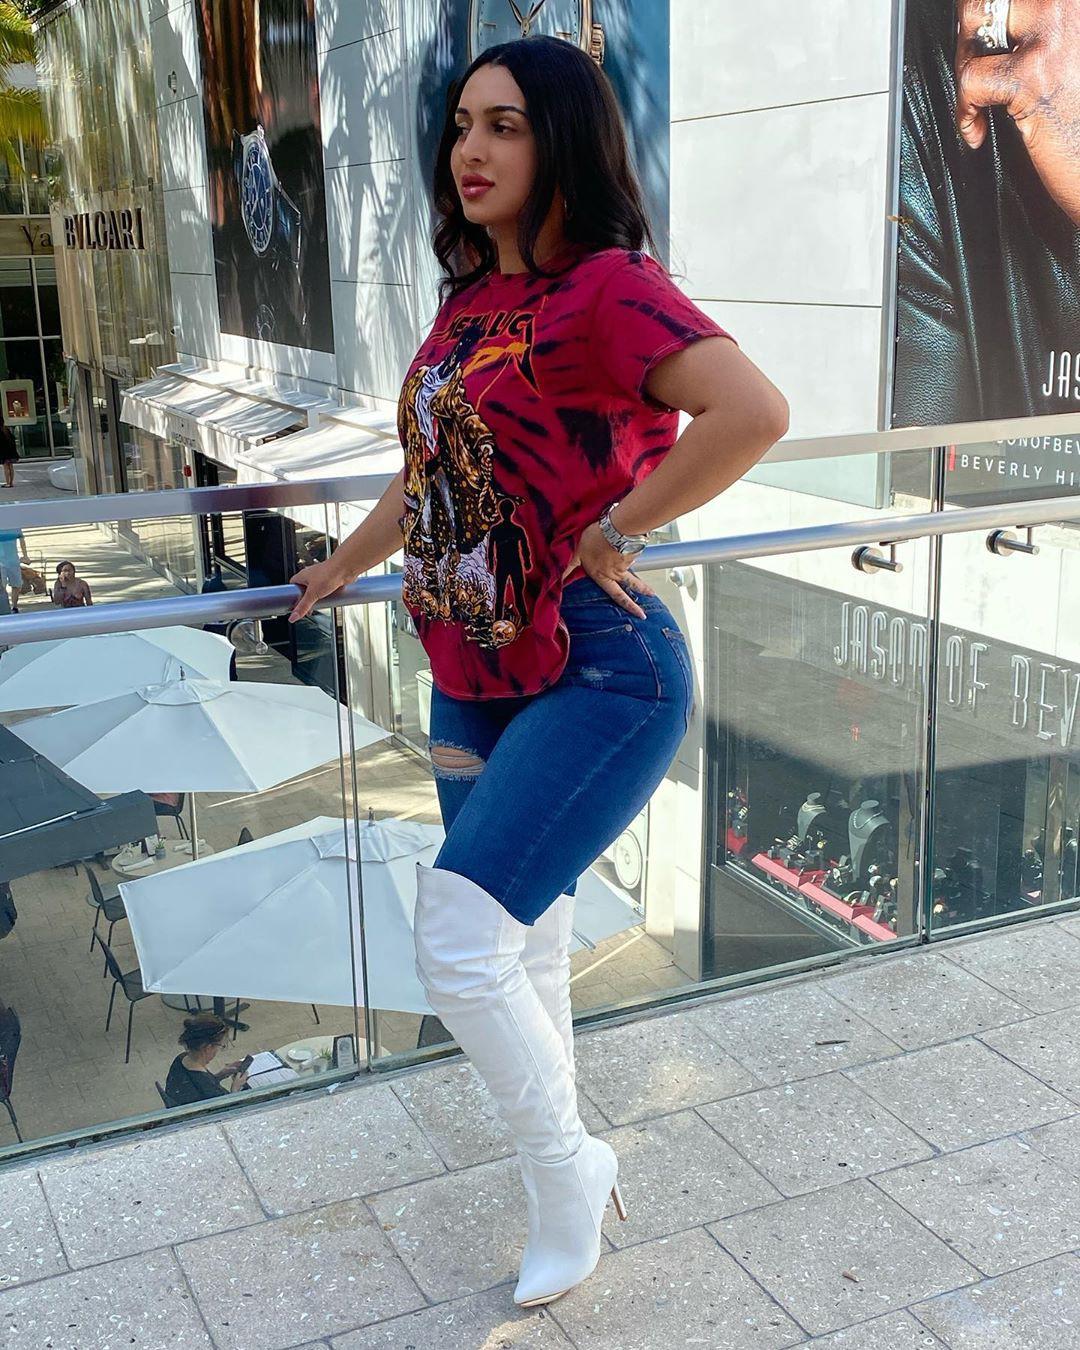 Nebby Fusco trousers, denim, jeans outfit ideas